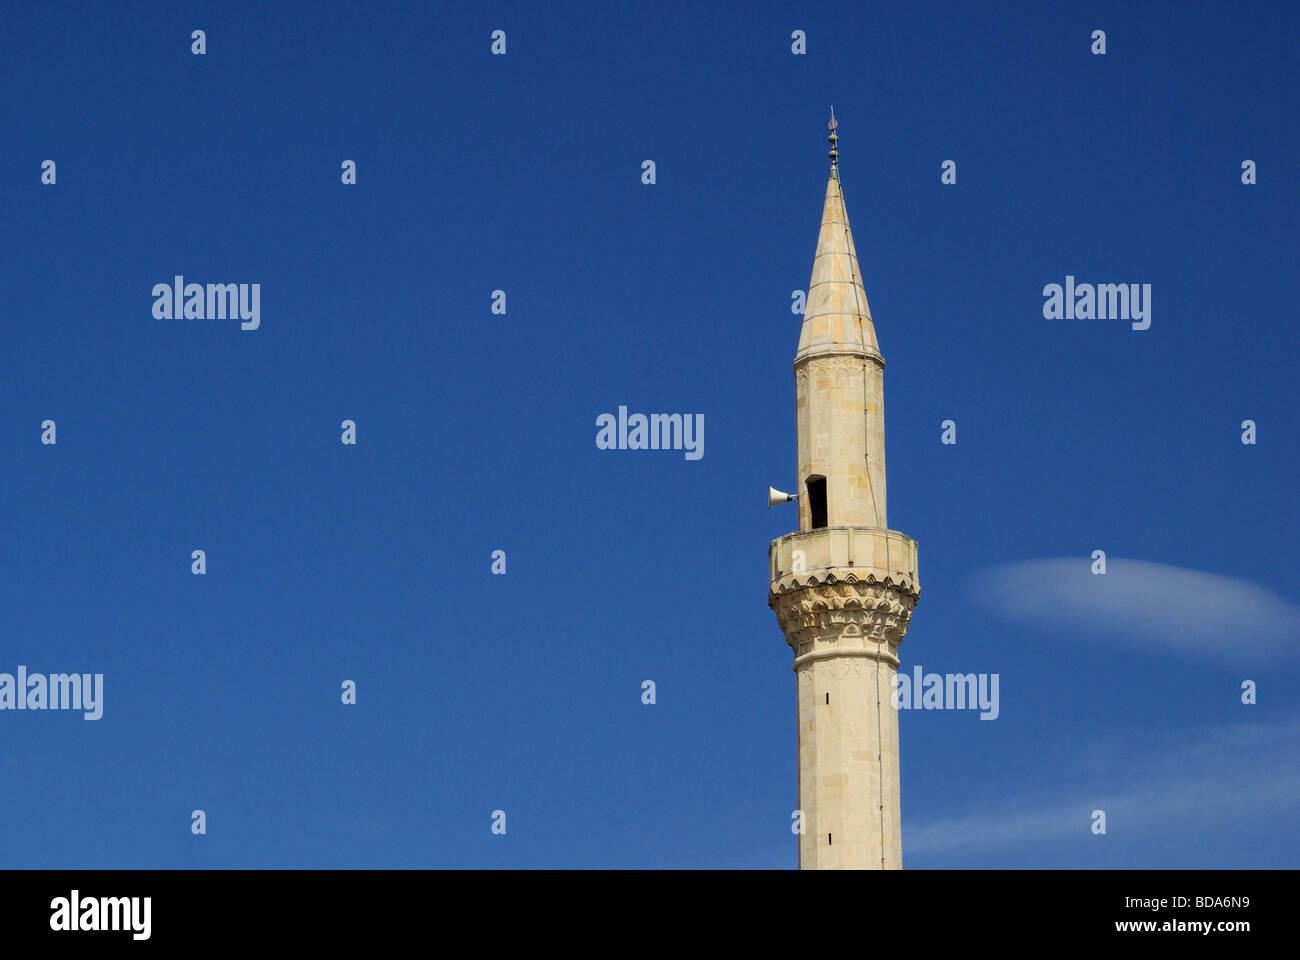 Mostar Moschee Mostar mosque 05 - Stock Image